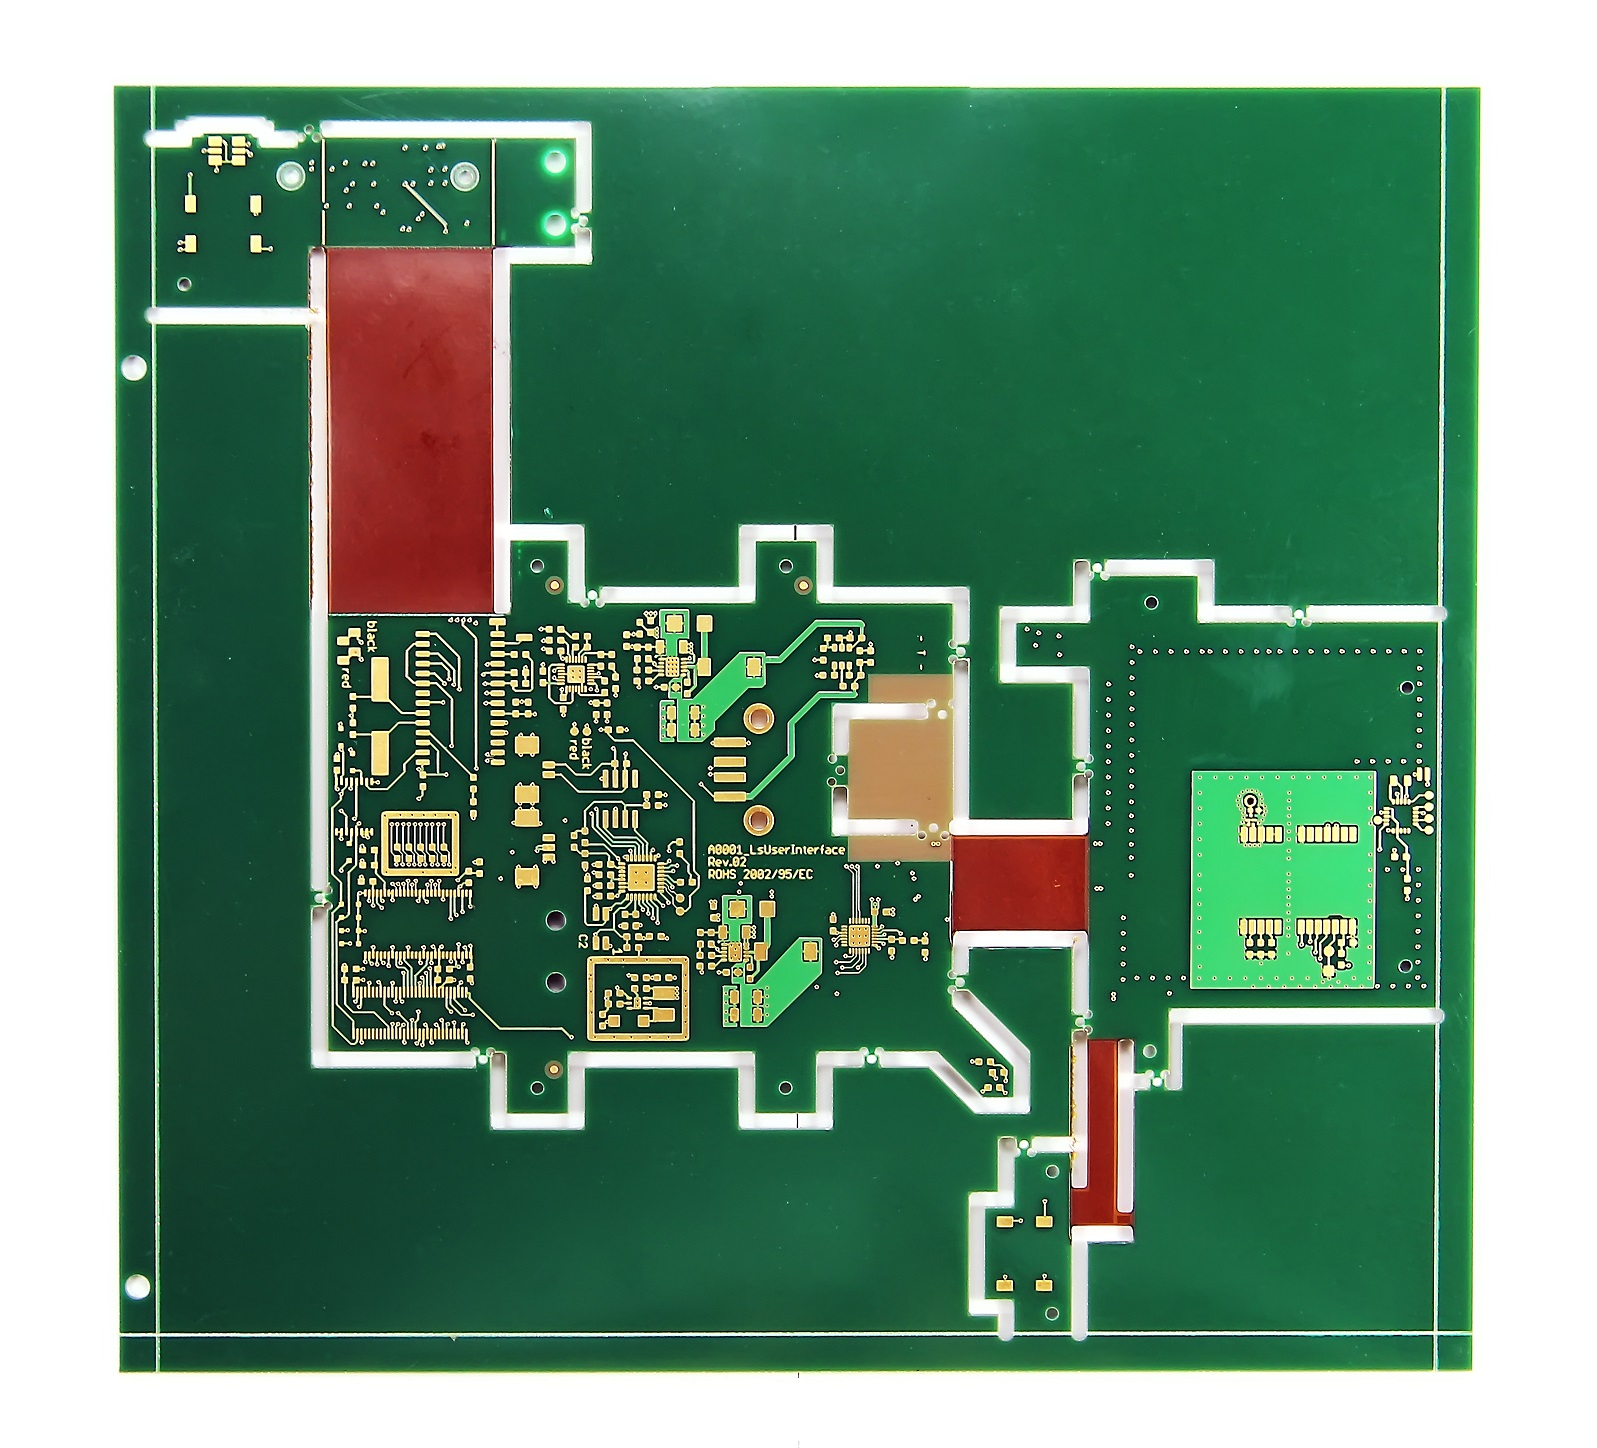 Ibe Electronics Usa Llc Hillsboro Oregon Or 97124 Image Lead Free Pcb Assembly Rohs Printed Circuit Board Assemblies 4 Layers Flex Rigid 2